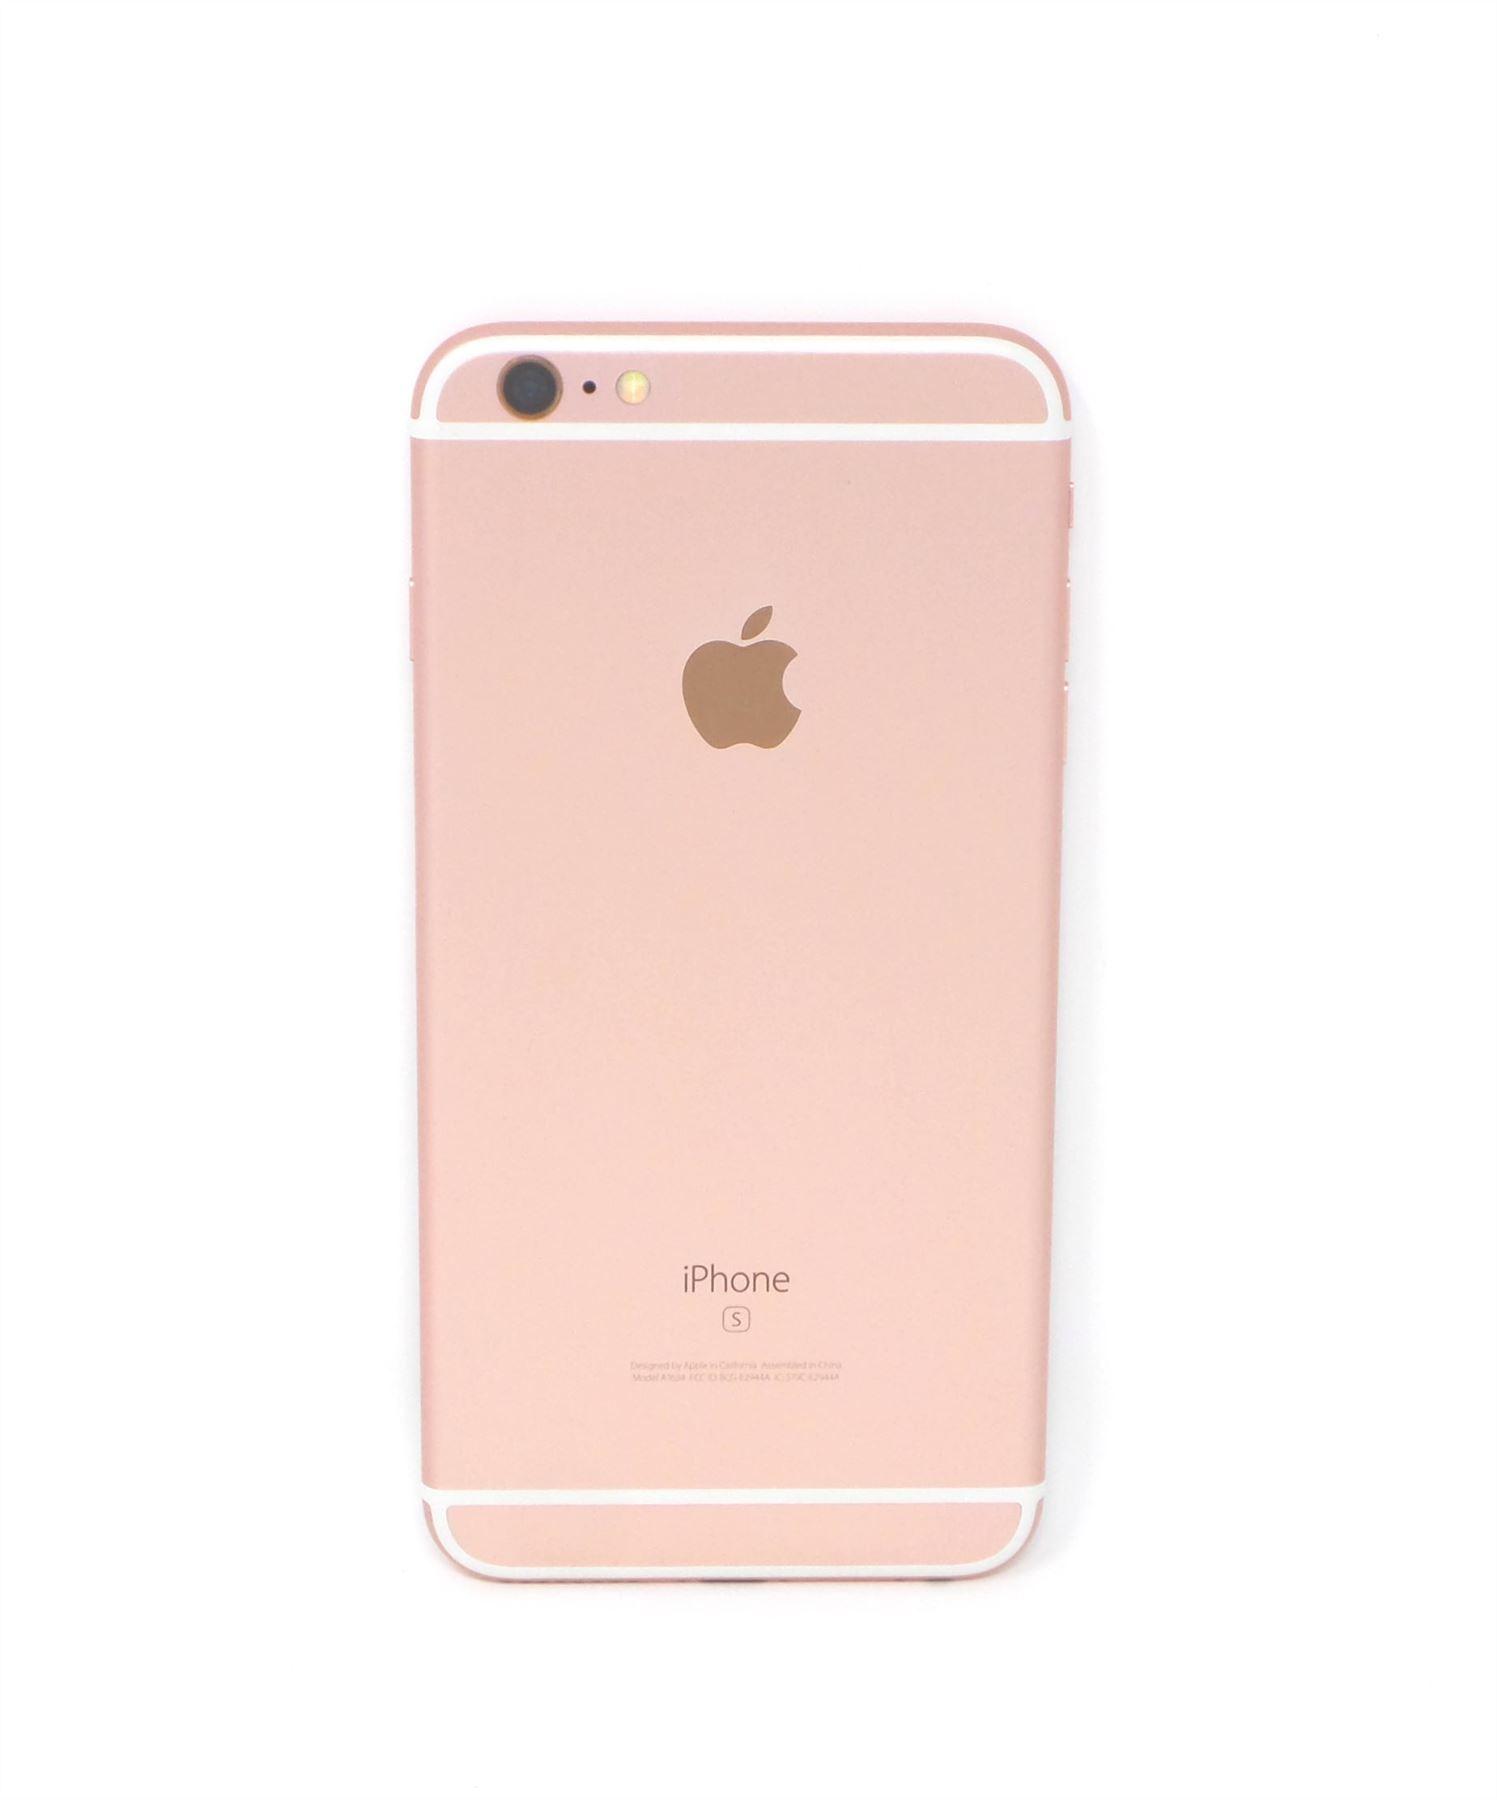 Apple-iPhone-6S-Plus-Carrier-Options-AT-amp-T-T-Mobile-Verizon-Unlocked-16-64-128GB thumbnail 14